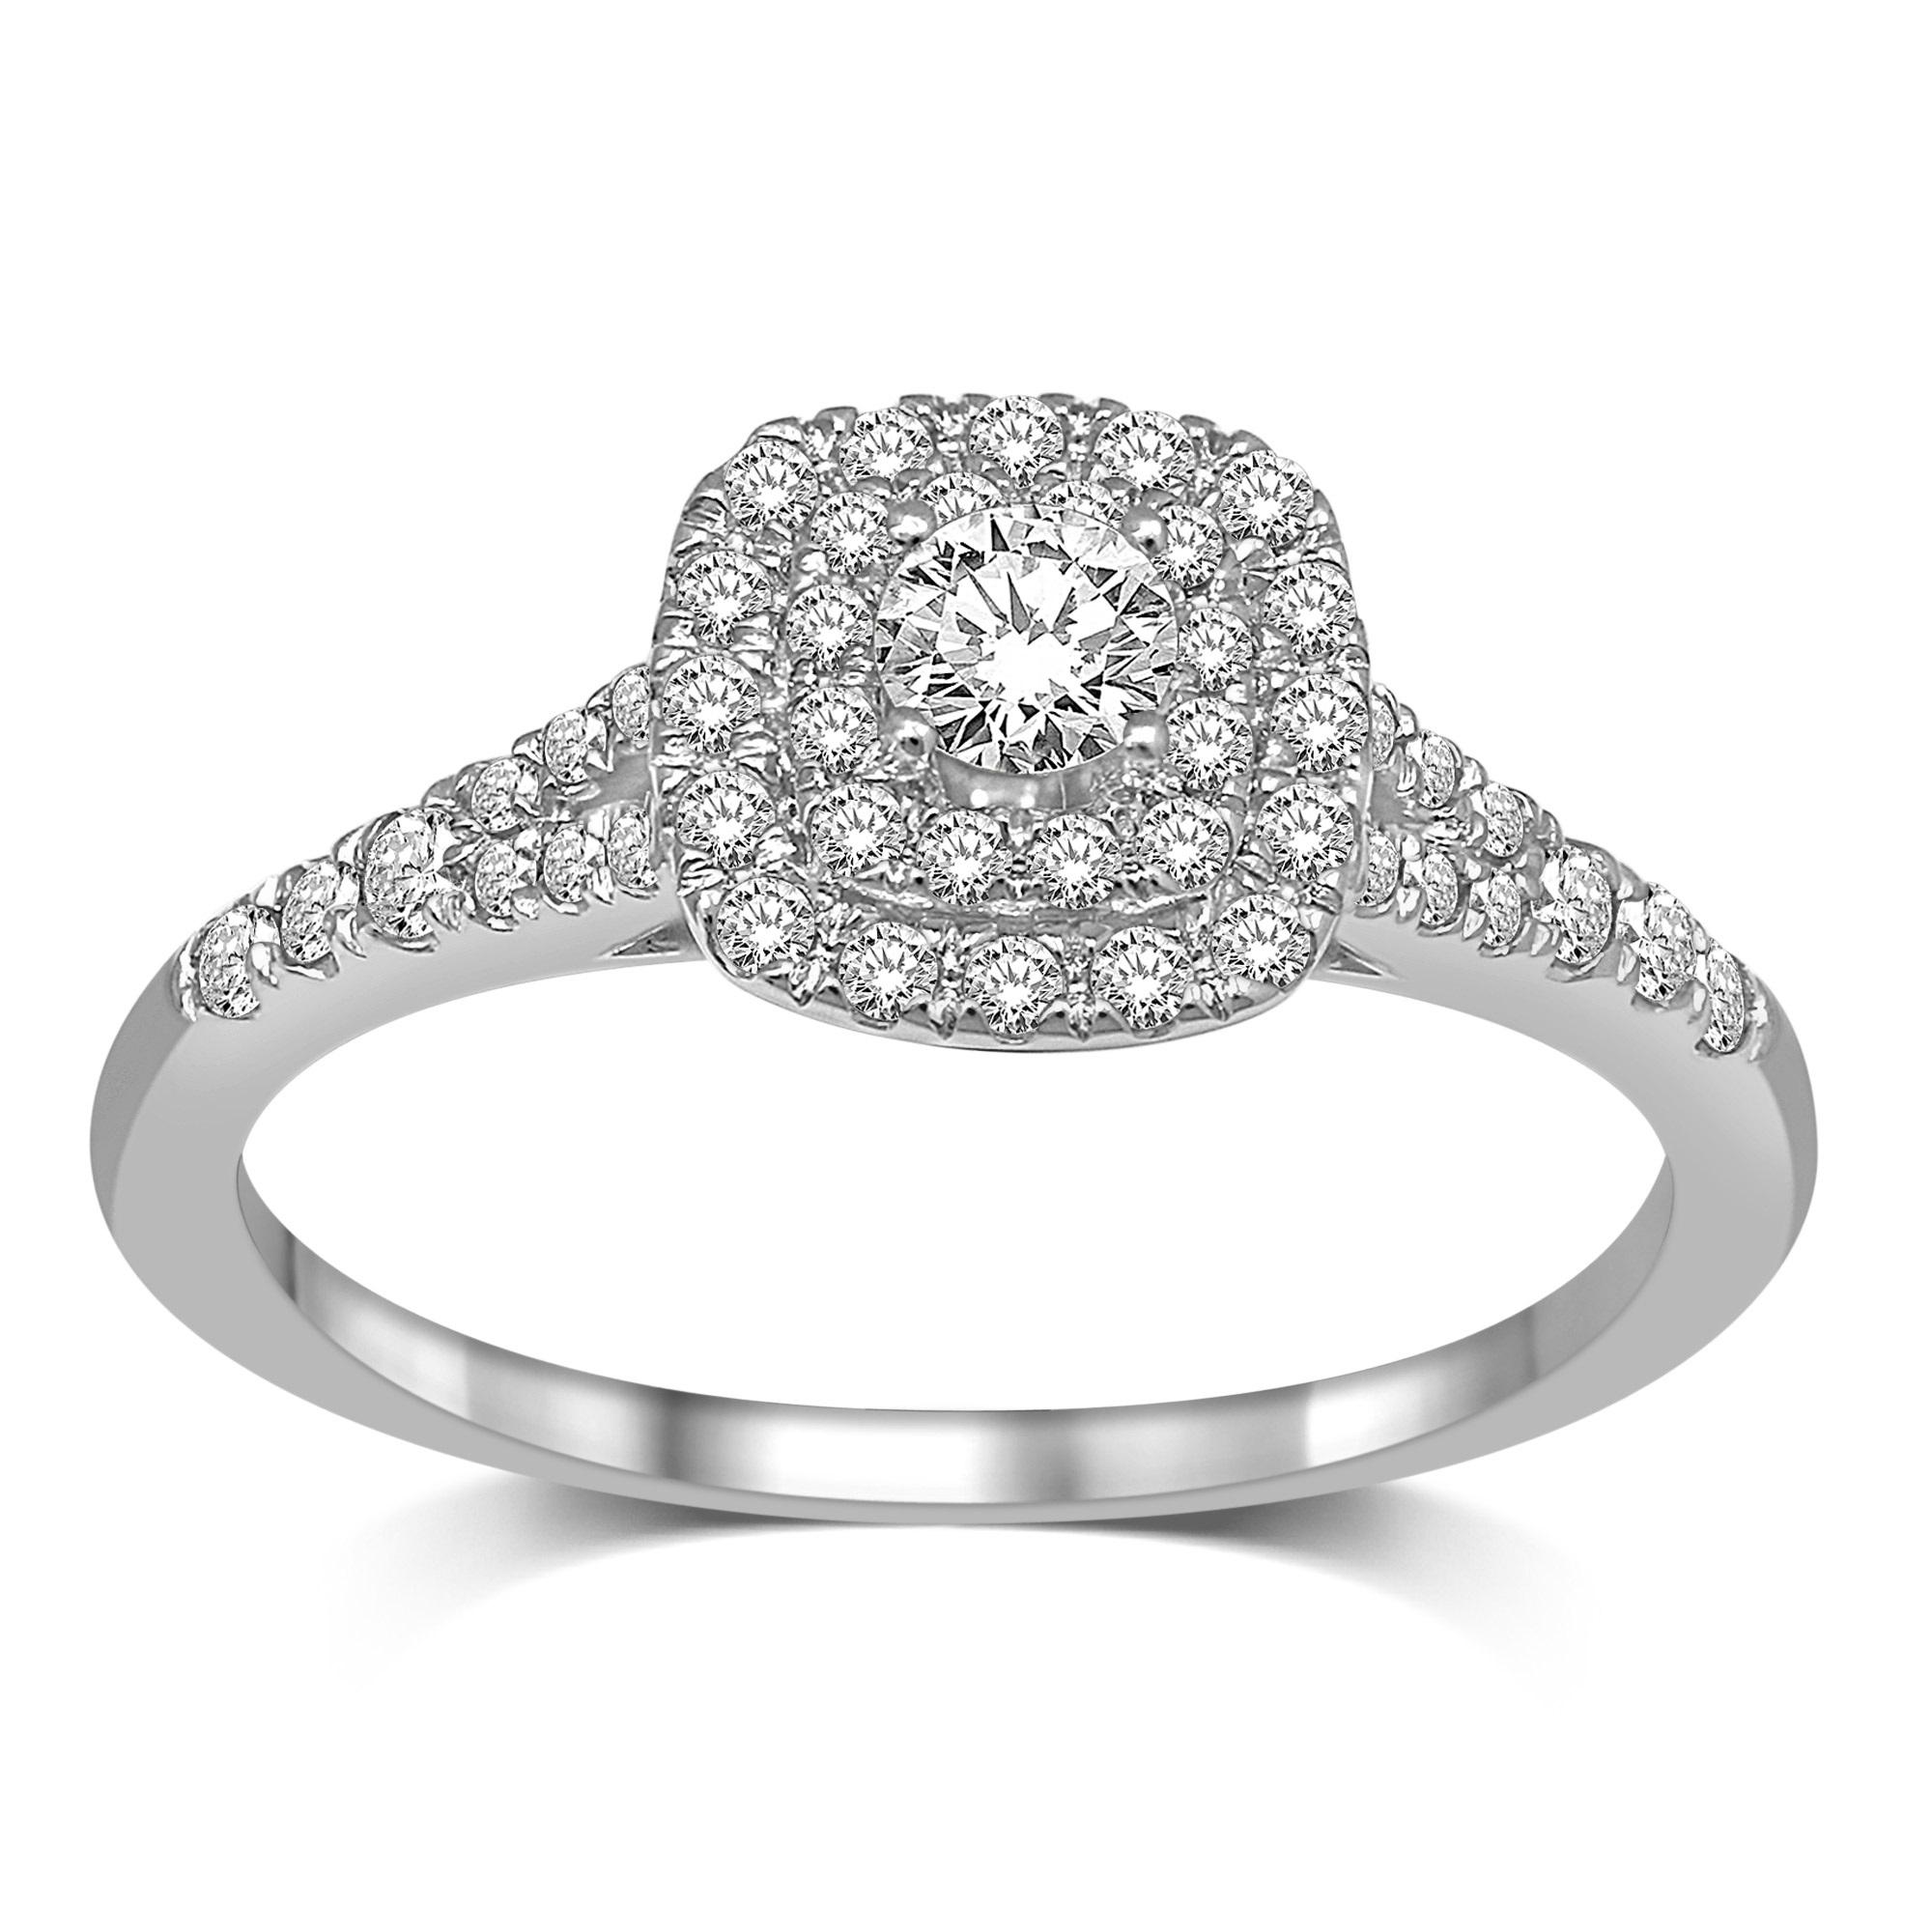 Engagement ring - 10K white gold & Diamonds T.W. 0.50 carat